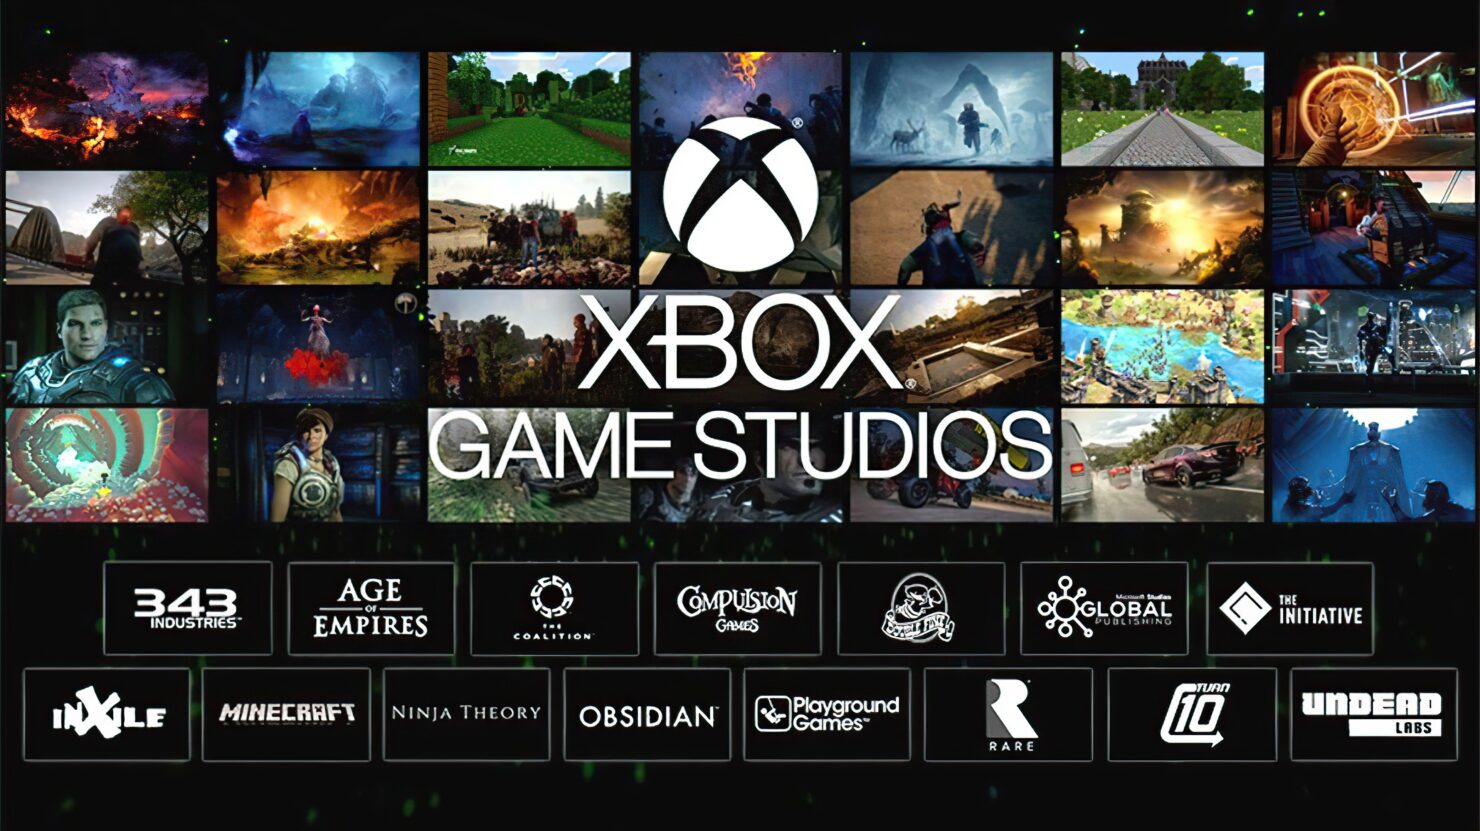 Xbox Game Studios user generated content